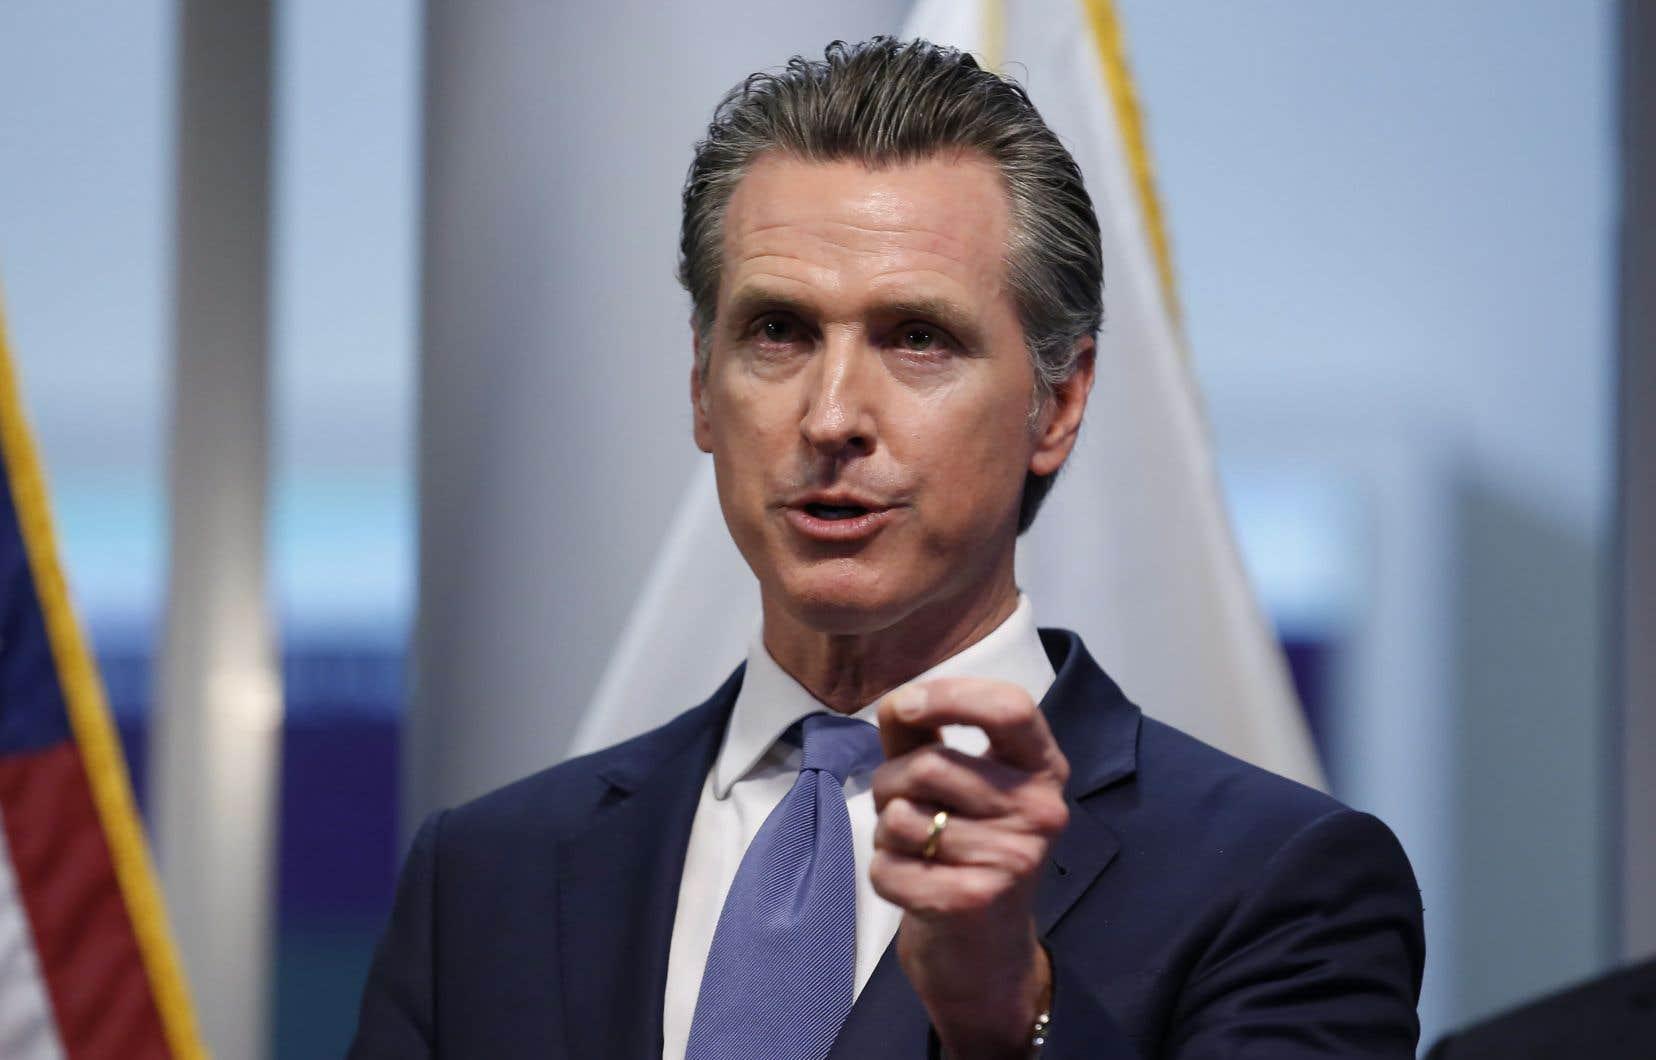 Le gouverneur de Californie, Gavin Newsom